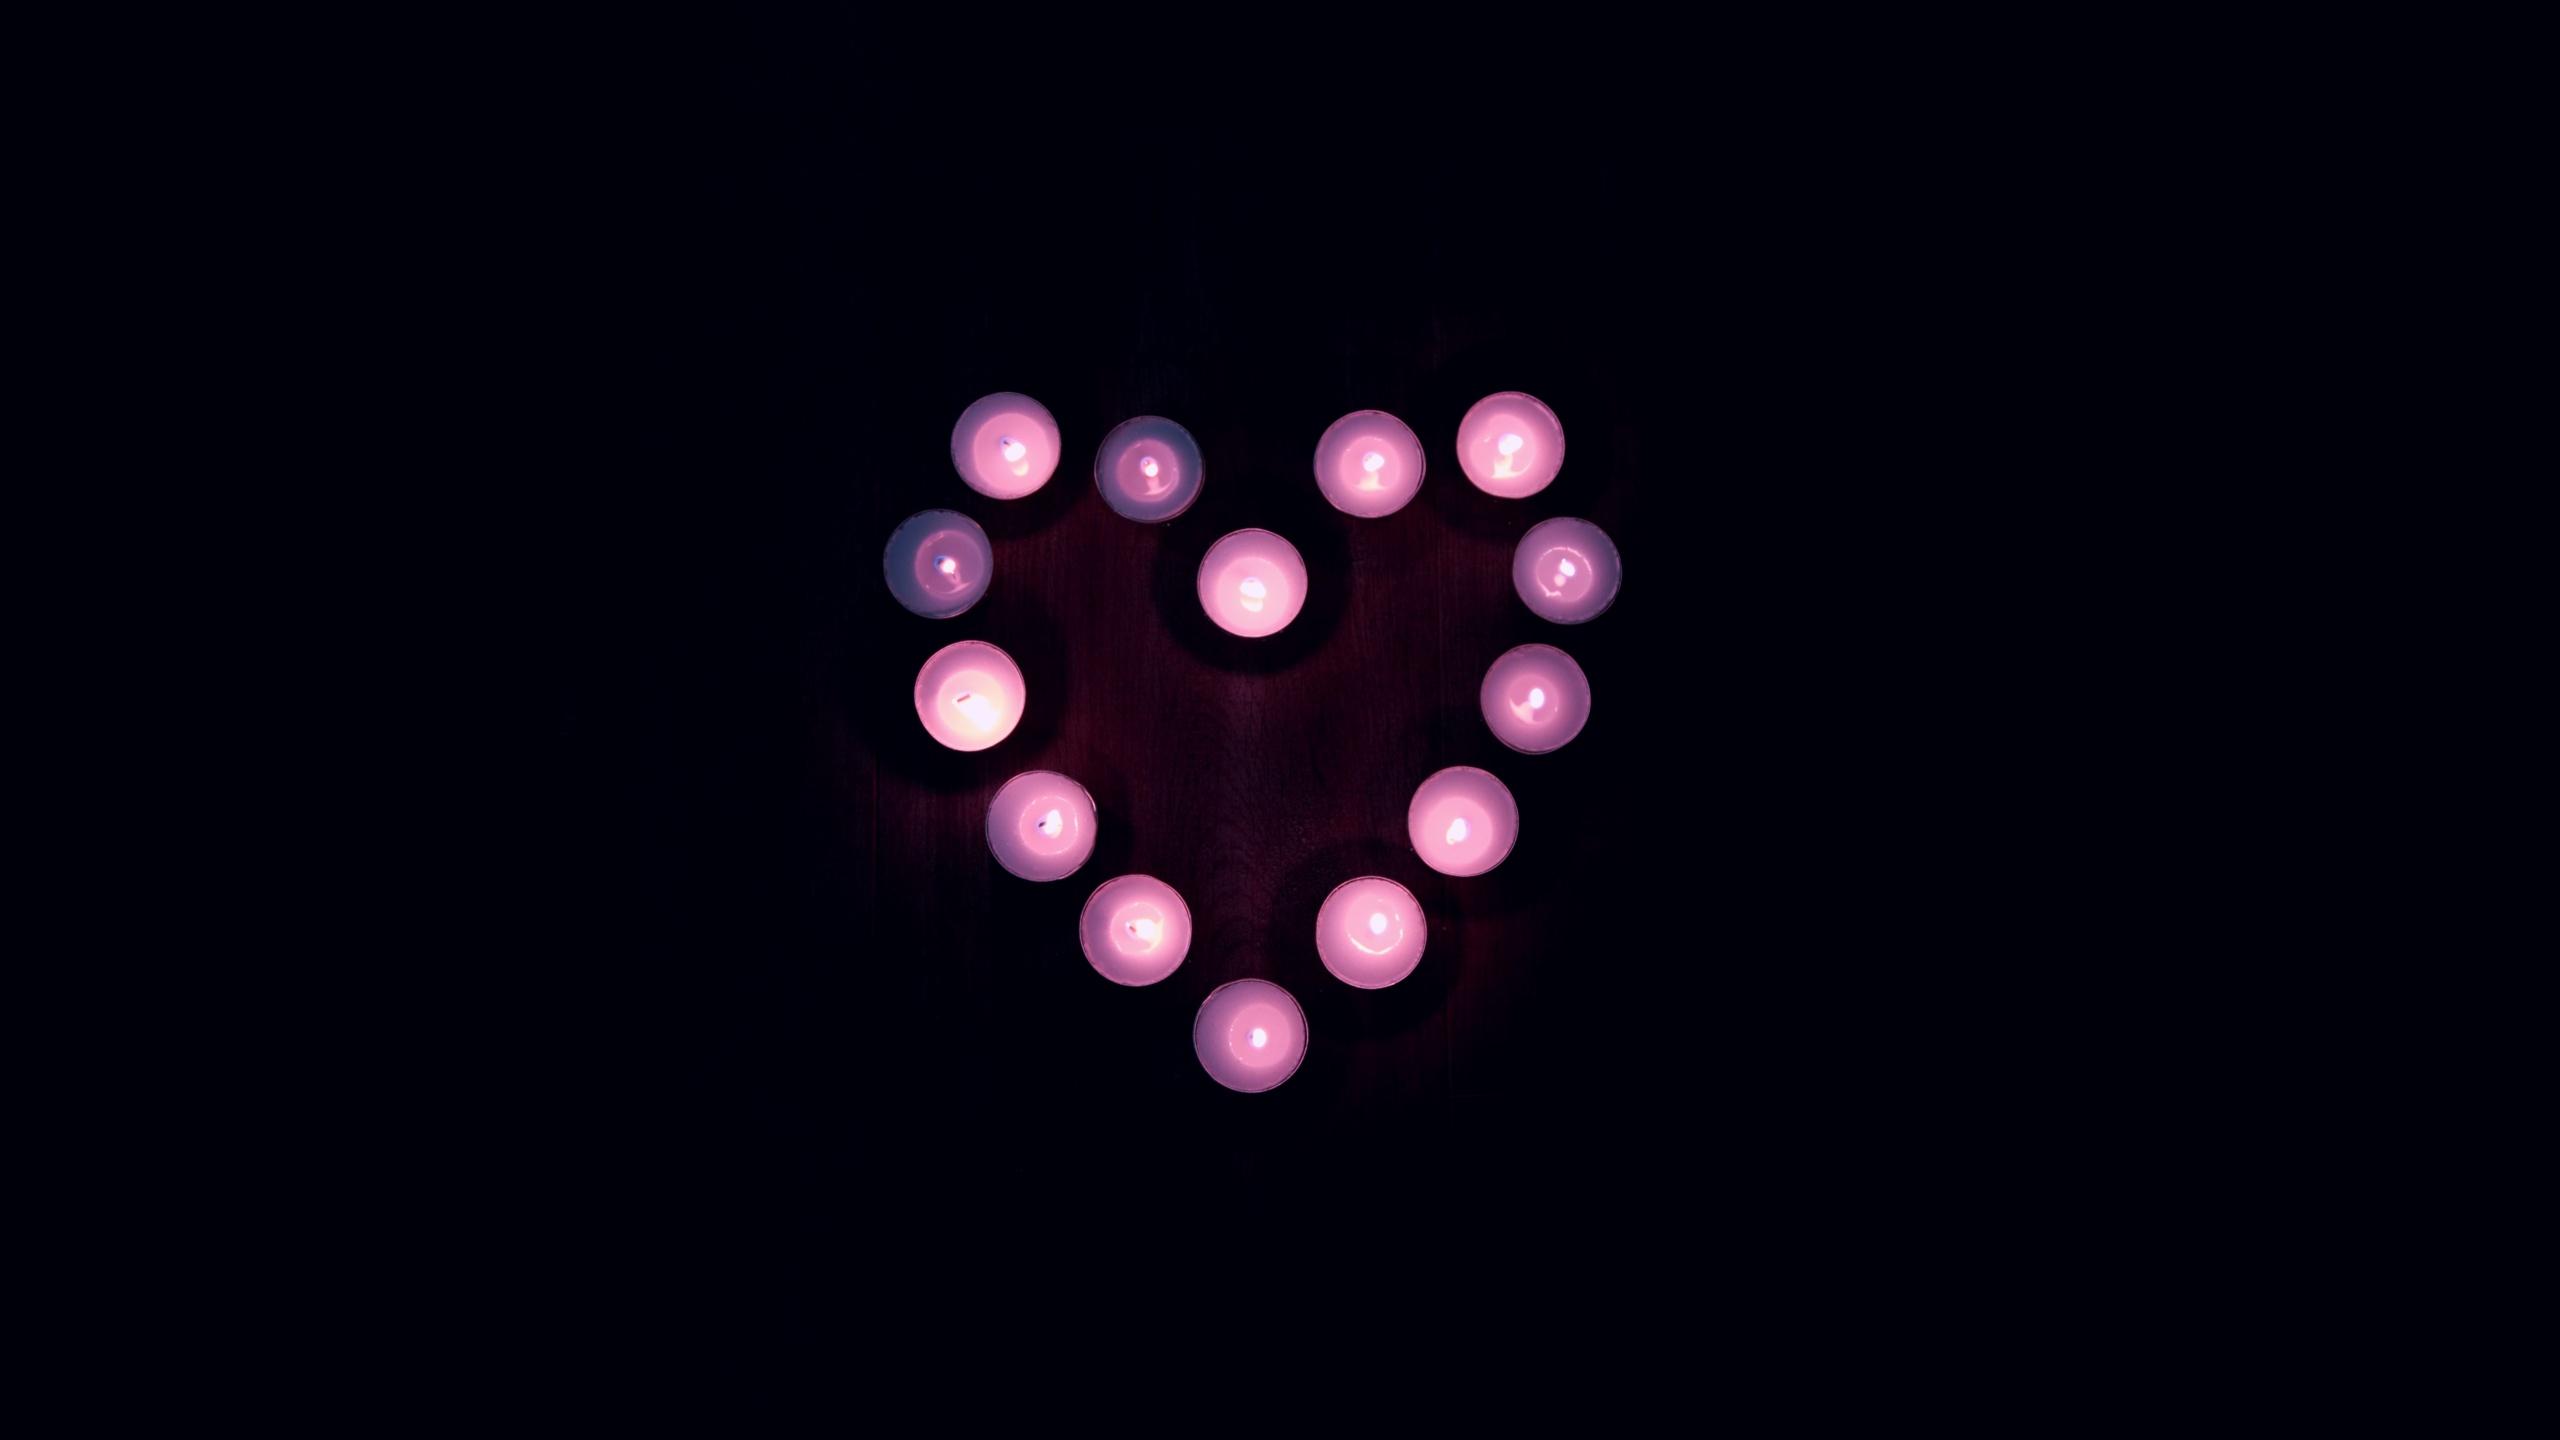 Love Heart 4k Wallpaper Candle Lights Black Background Pink Heart Tea Light 5k Black Dark 2382